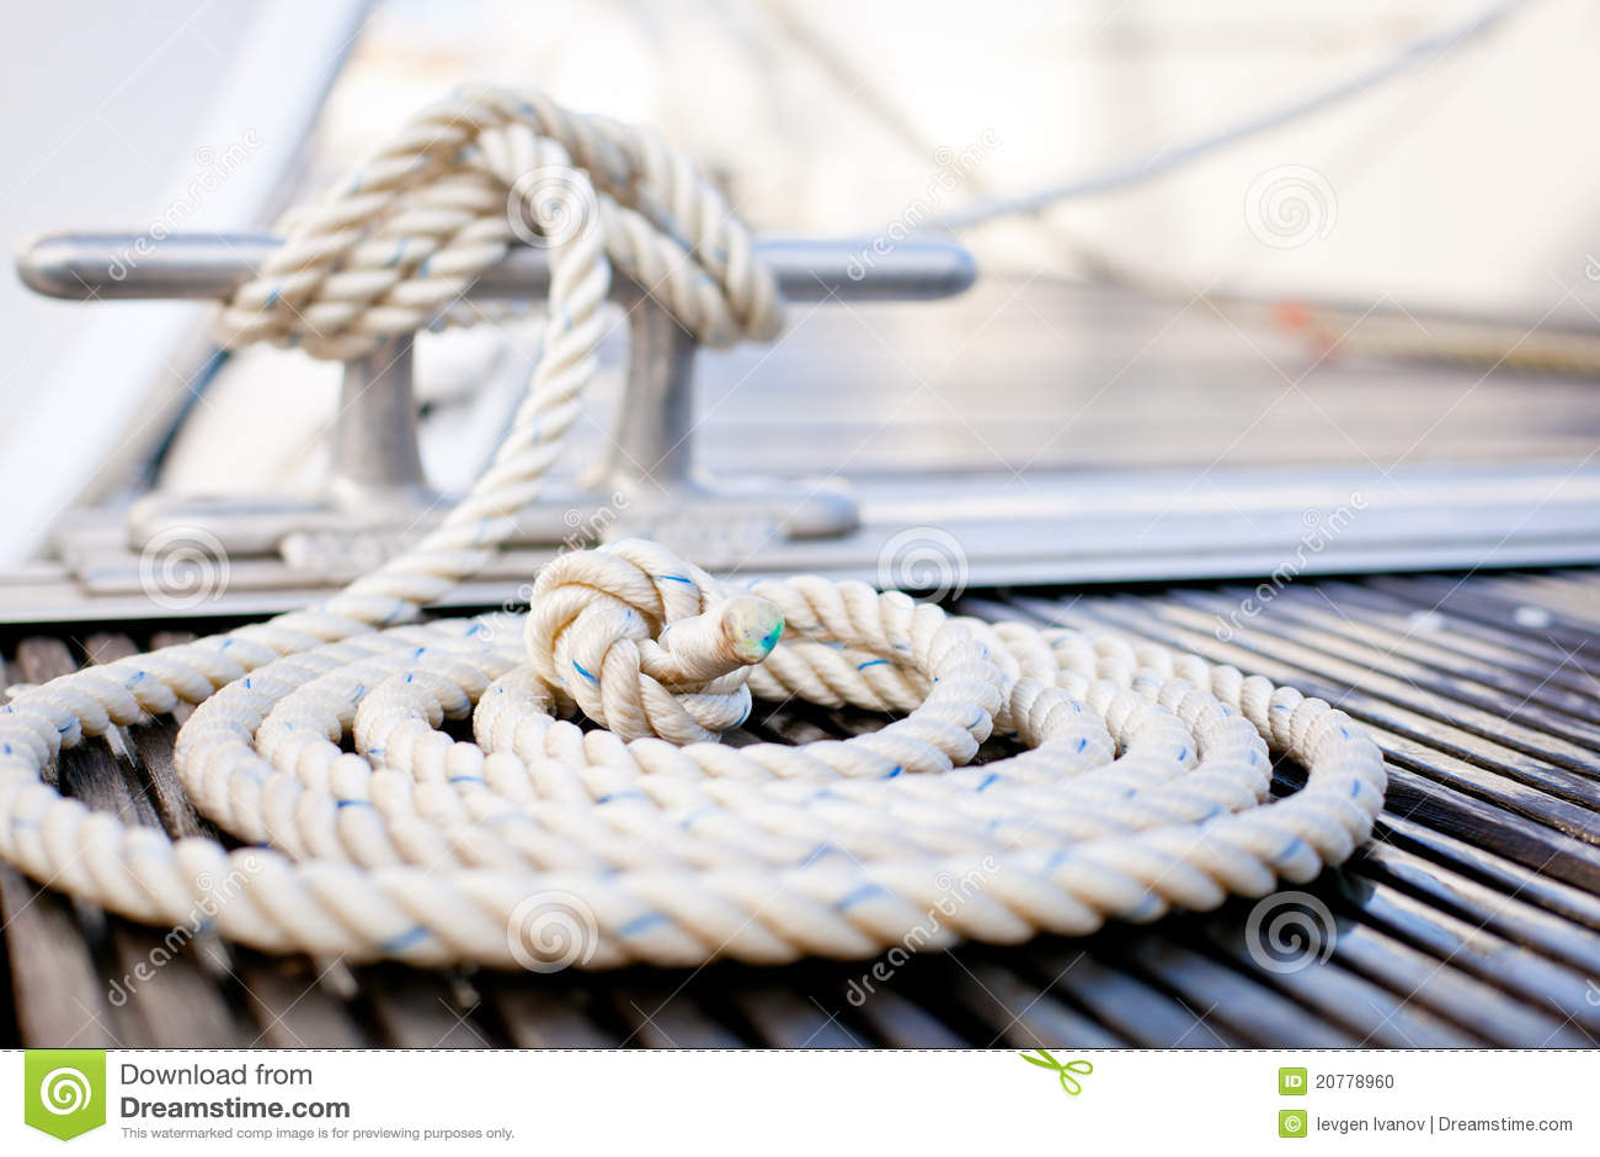 Seeverankerungs- Seil